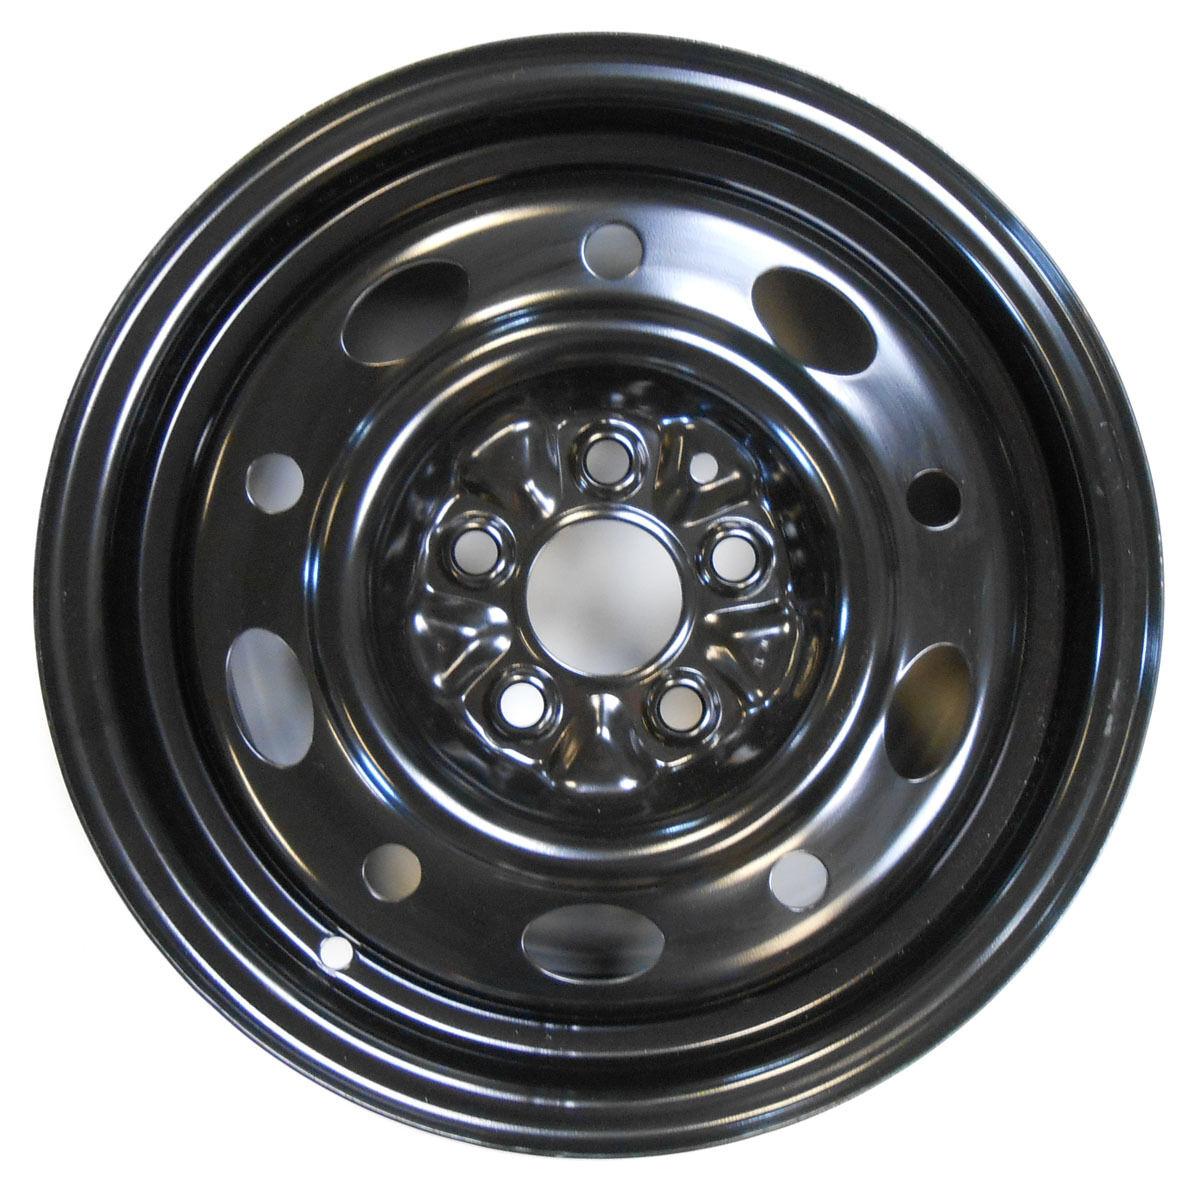 Brand New Mopar Chrysler Dodge Jeep Plymouth Wheel Tire Rim Black Steel